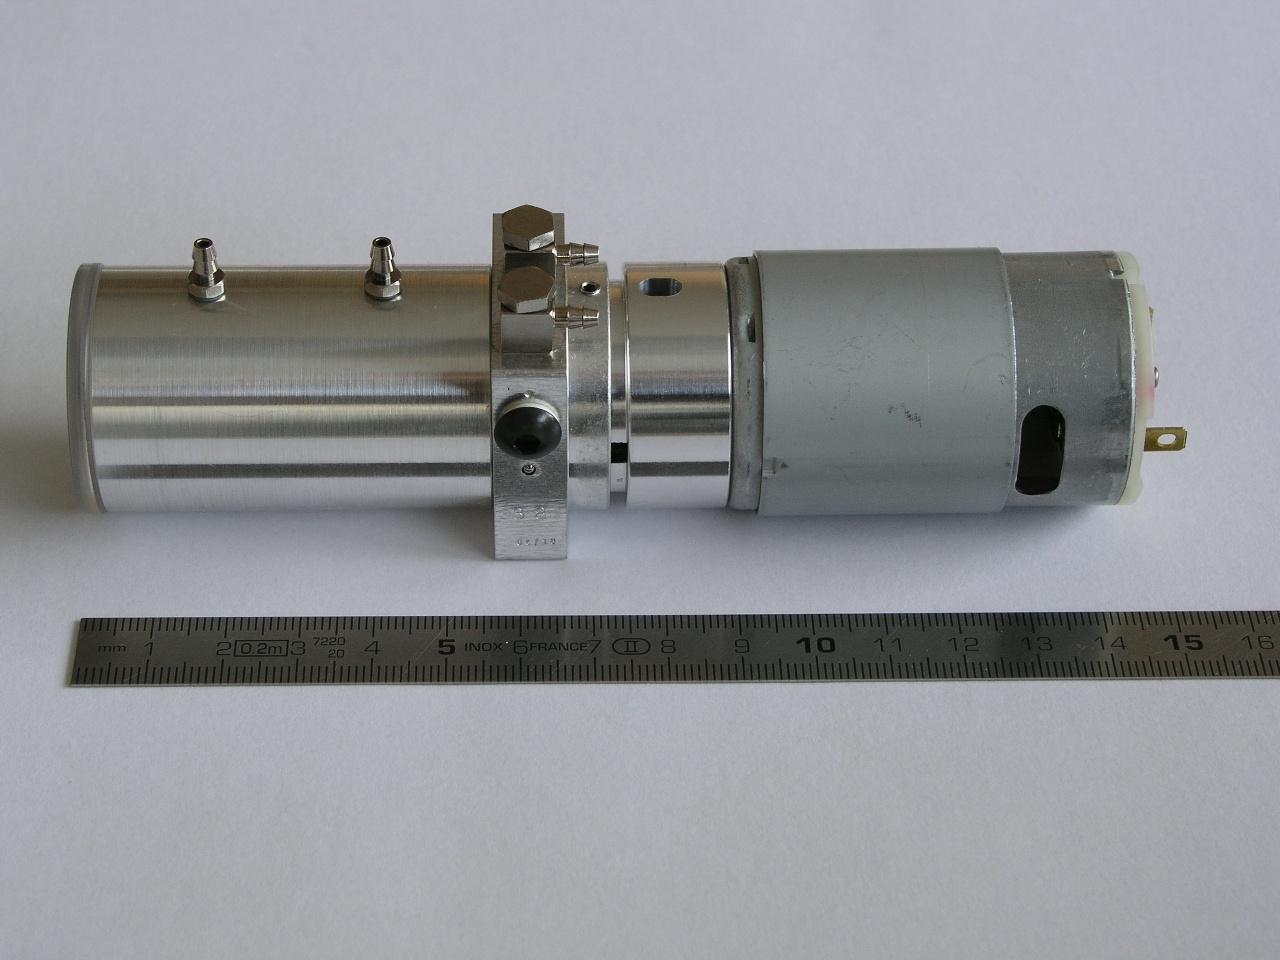 Leimbach Standard Hydraulikpumpeneinheit M4(12V, 380ml/min)